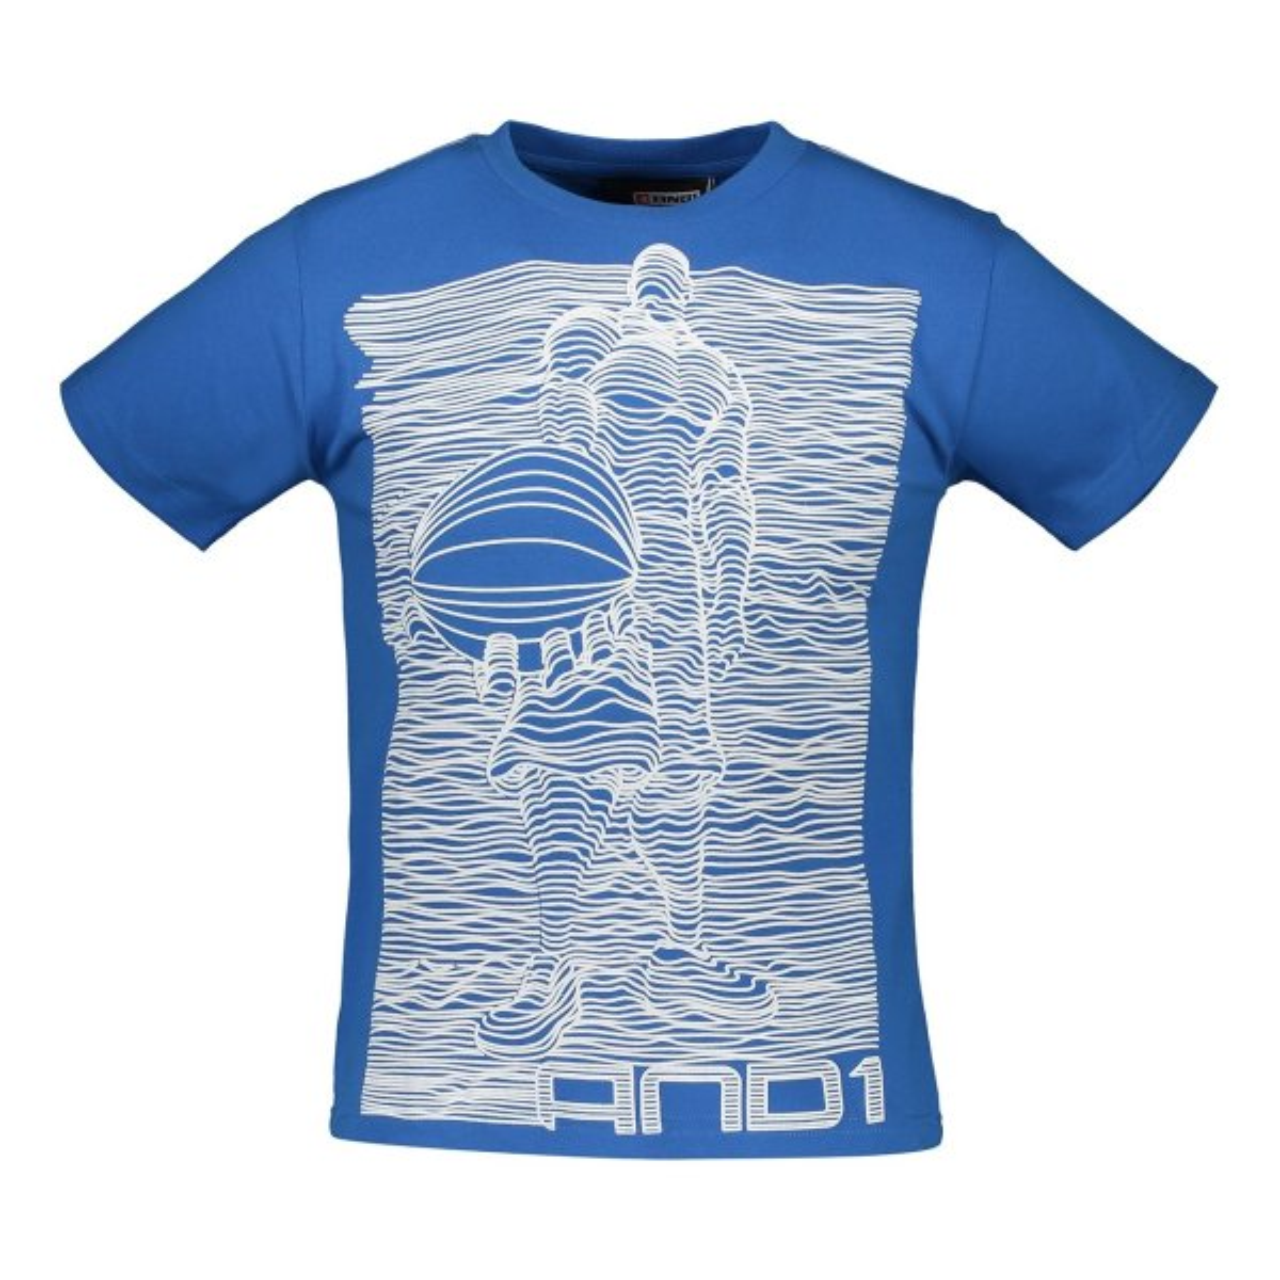 تیشرت ورزشی پسرانه AND1 مدلDAH6L117B-M-BLUE